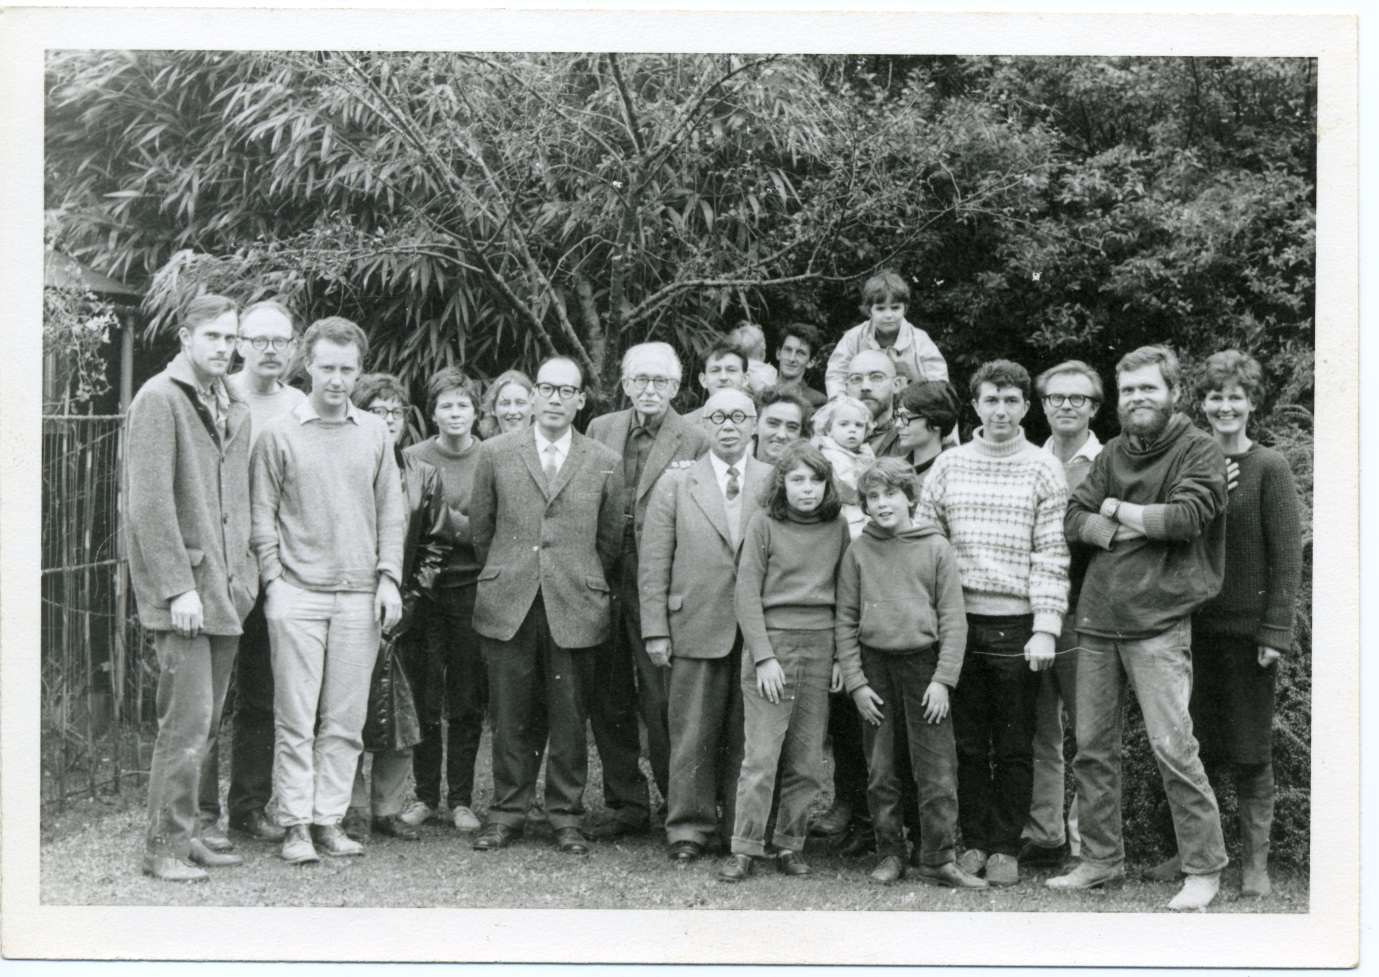 At the Leach Pottery, 1963. Left to right: Ian Steele, Warren MacKenzie, Michael Henry, unknown, Pat Ashmore, Jean Vinicombe, Shinsaku Hamada, Bernard Leach, Shoji Hamada, Bill Marshall, Scott Marshall, Janet Leach, Warren MacKenzie